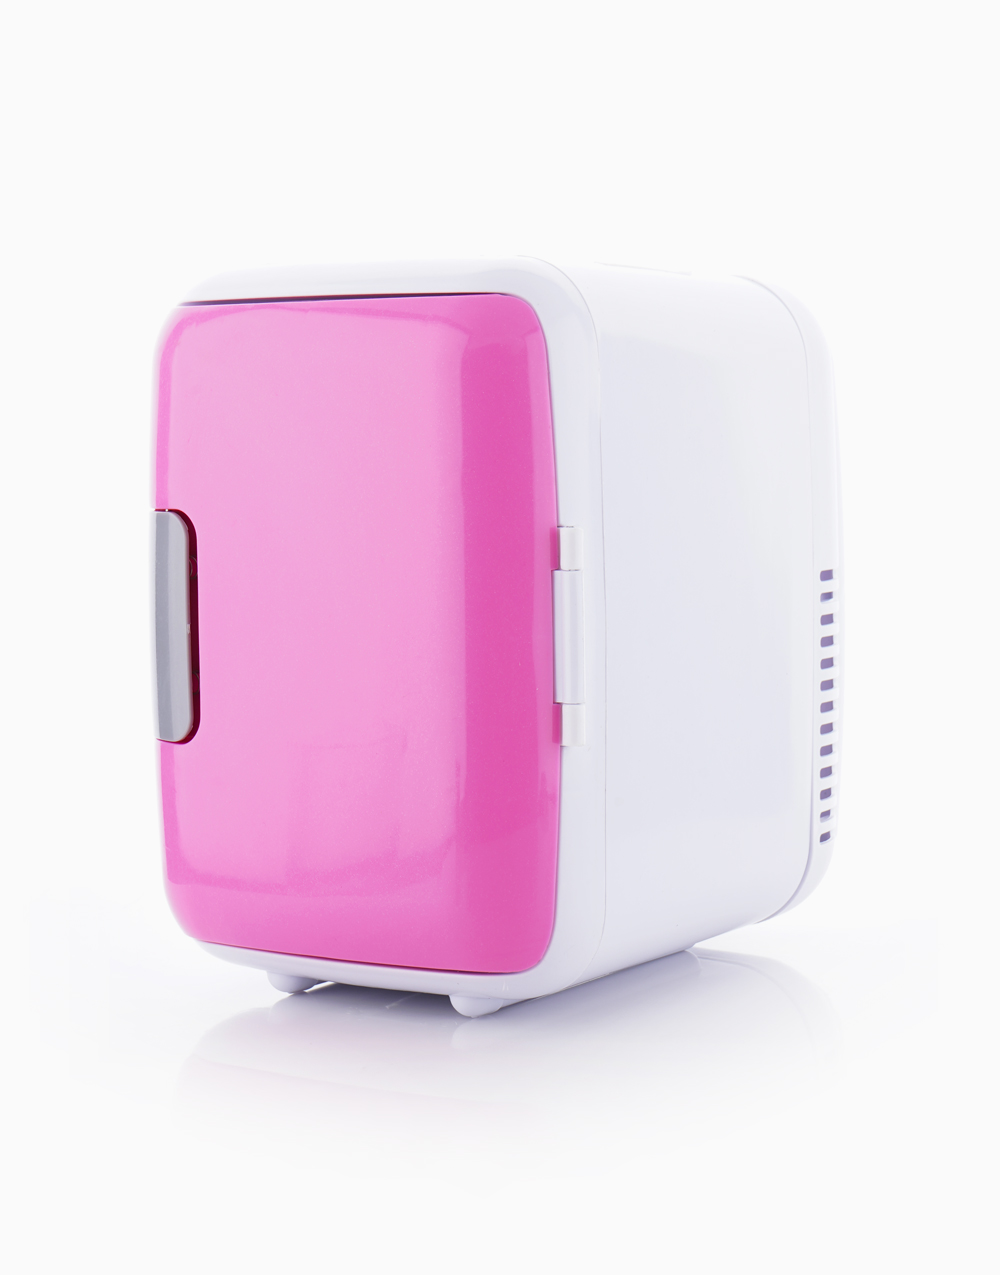 Mini Fridge Refrigerator by Honest Tools